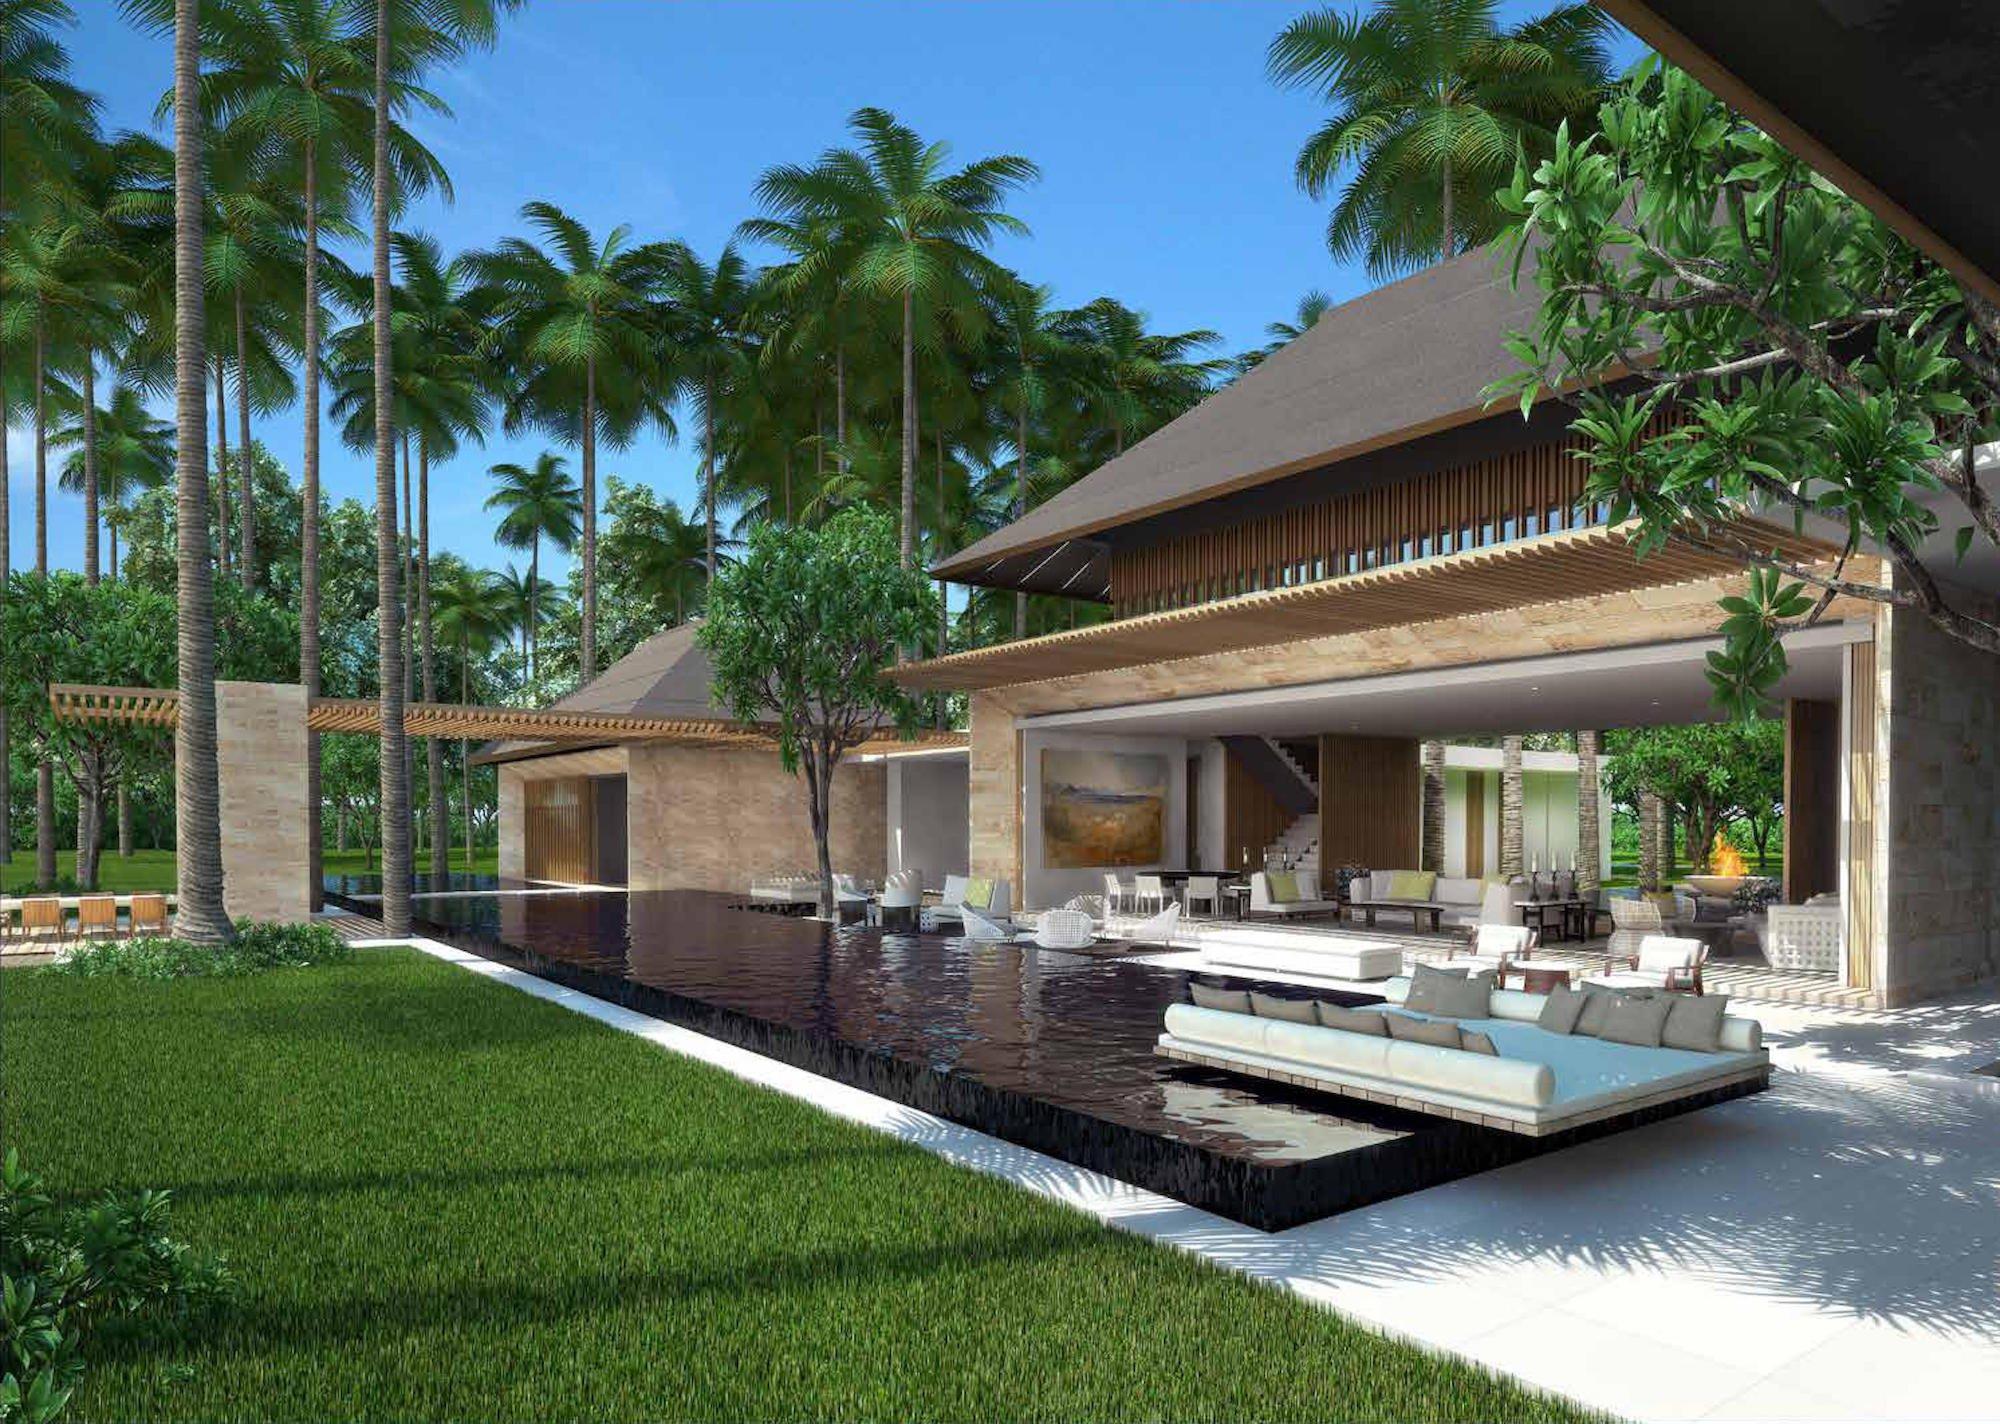 Leo Resort 2 [Denniston International Architects & Planners Ltd.]